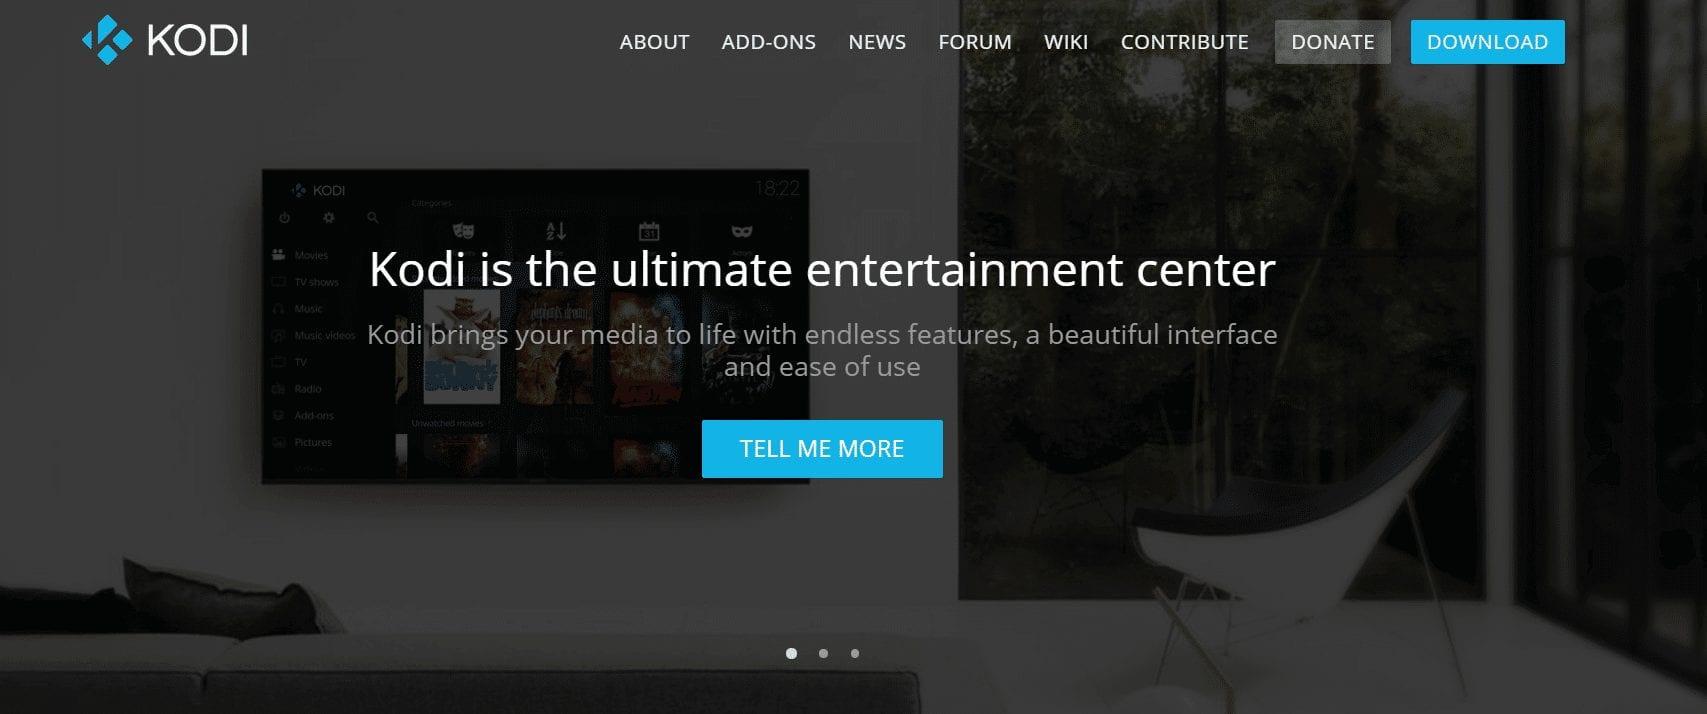 Kodi TV apps